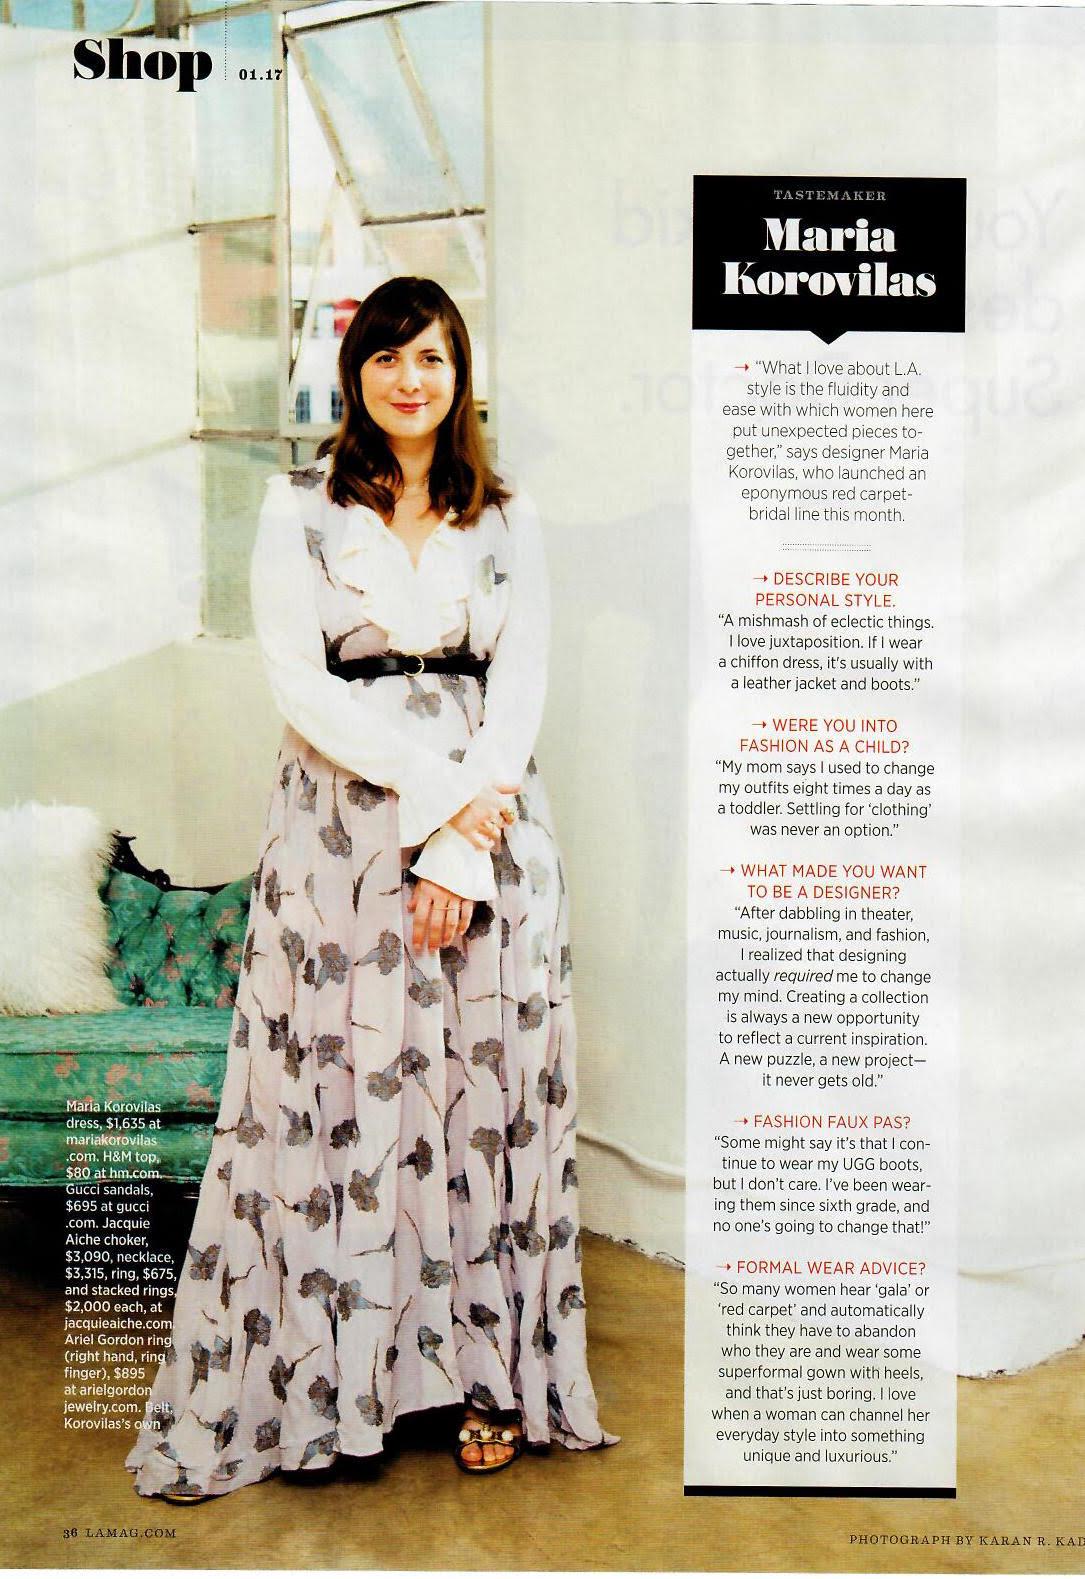 LA Magazine, January 2017